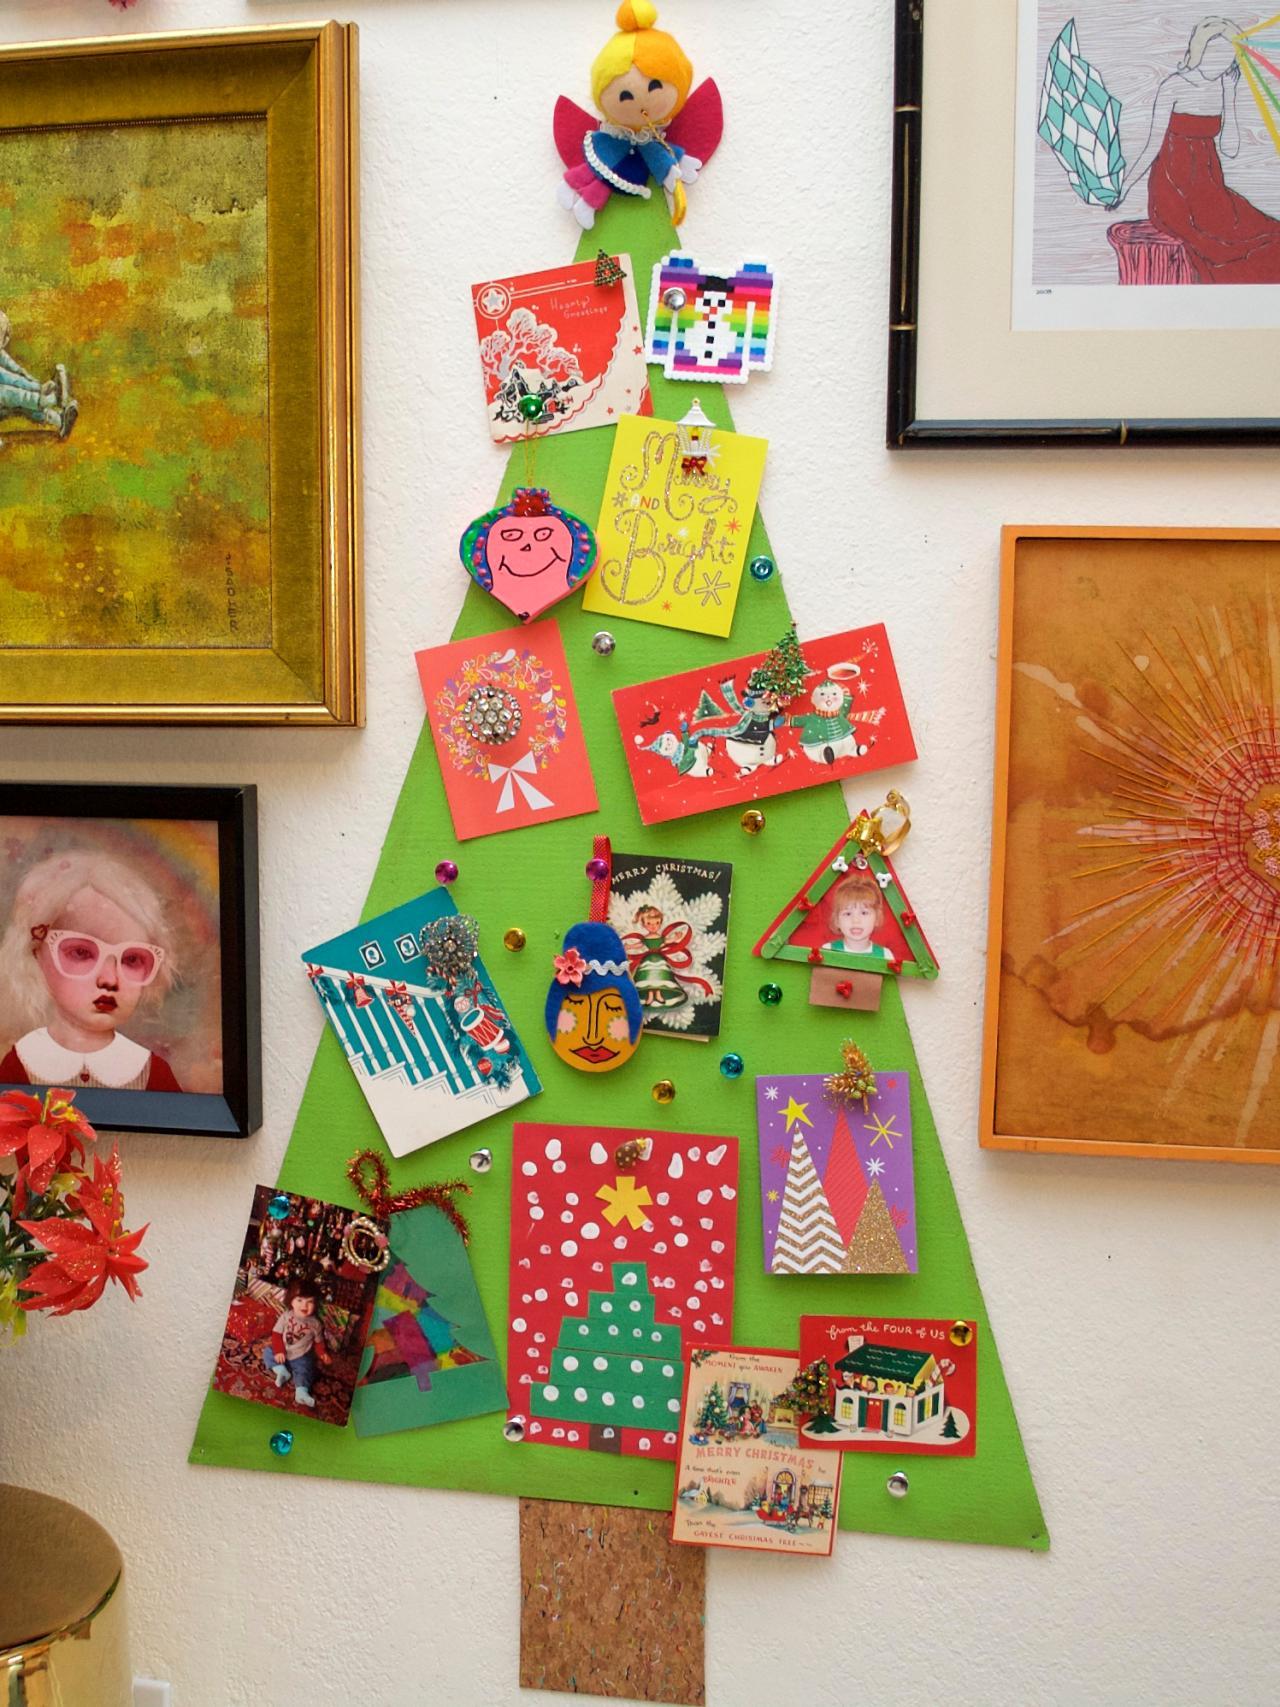 How To Make A Christmas Tree Corkboard To Display Greeting